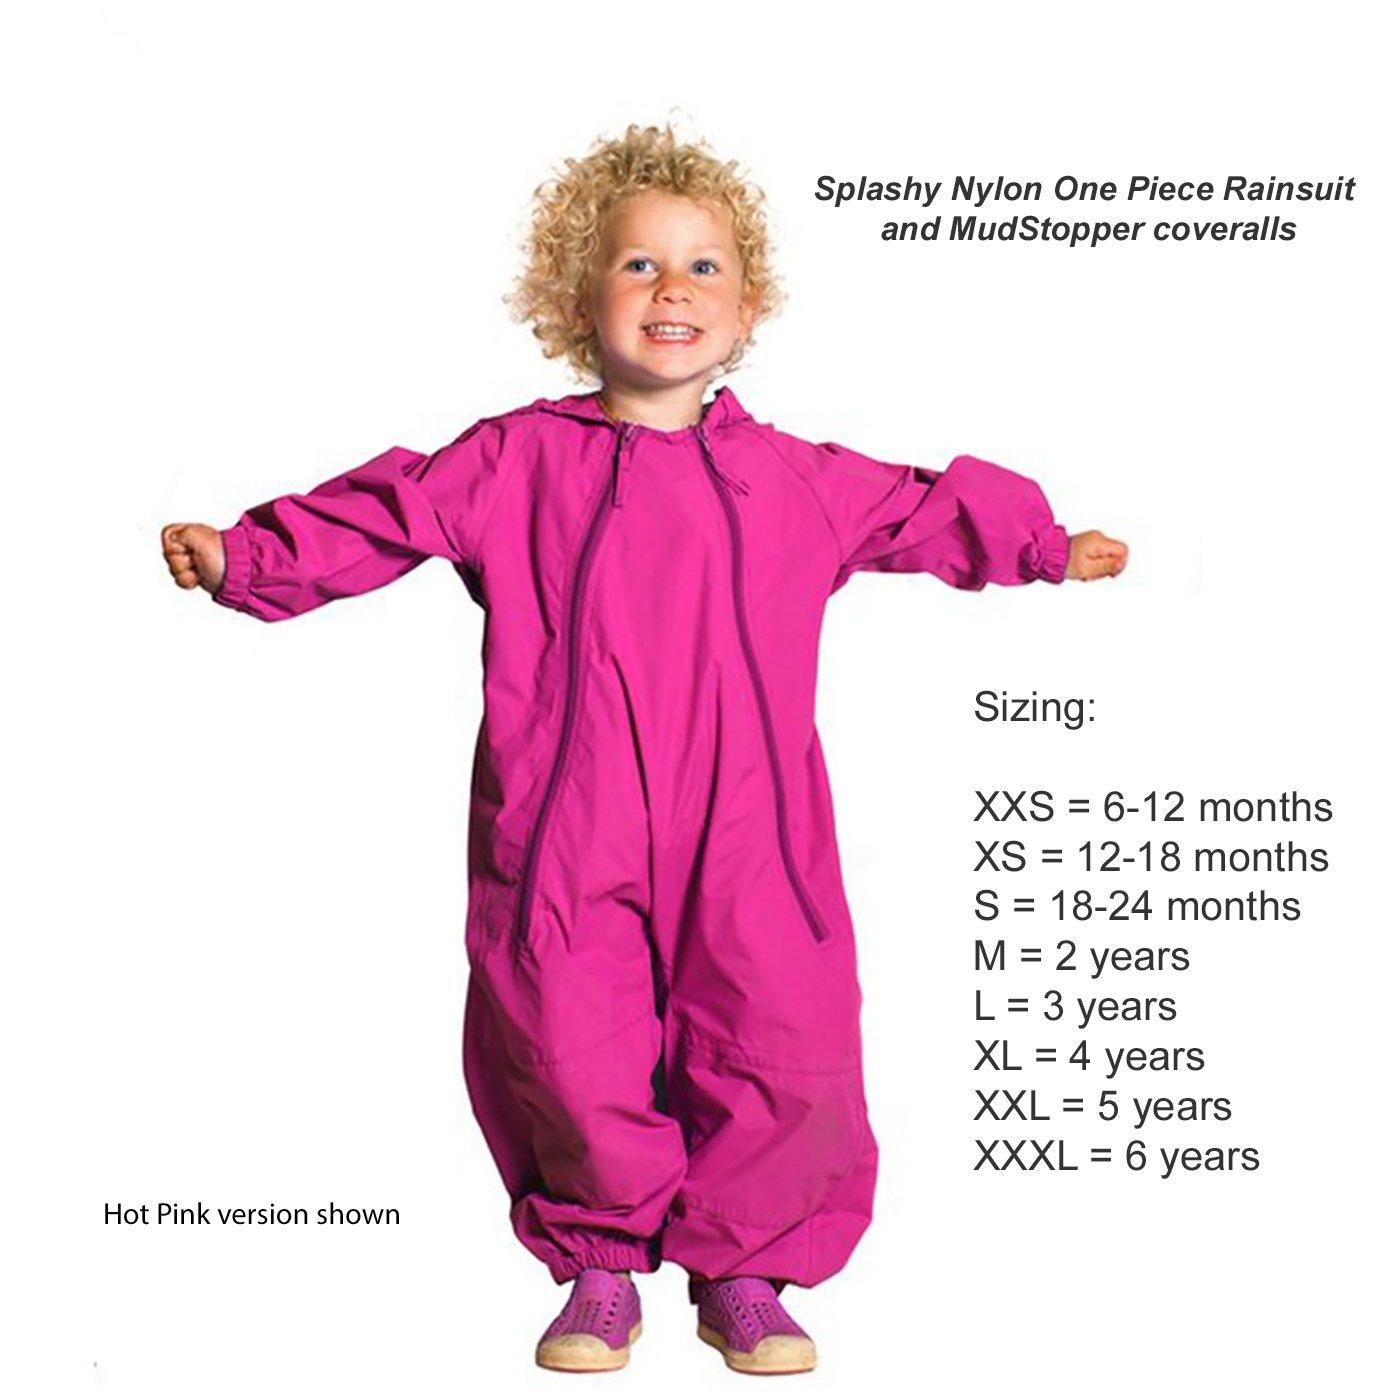 f3f38df51 Amazon.com  Splashy Nylon Children s One Piece Rainsuits and ...